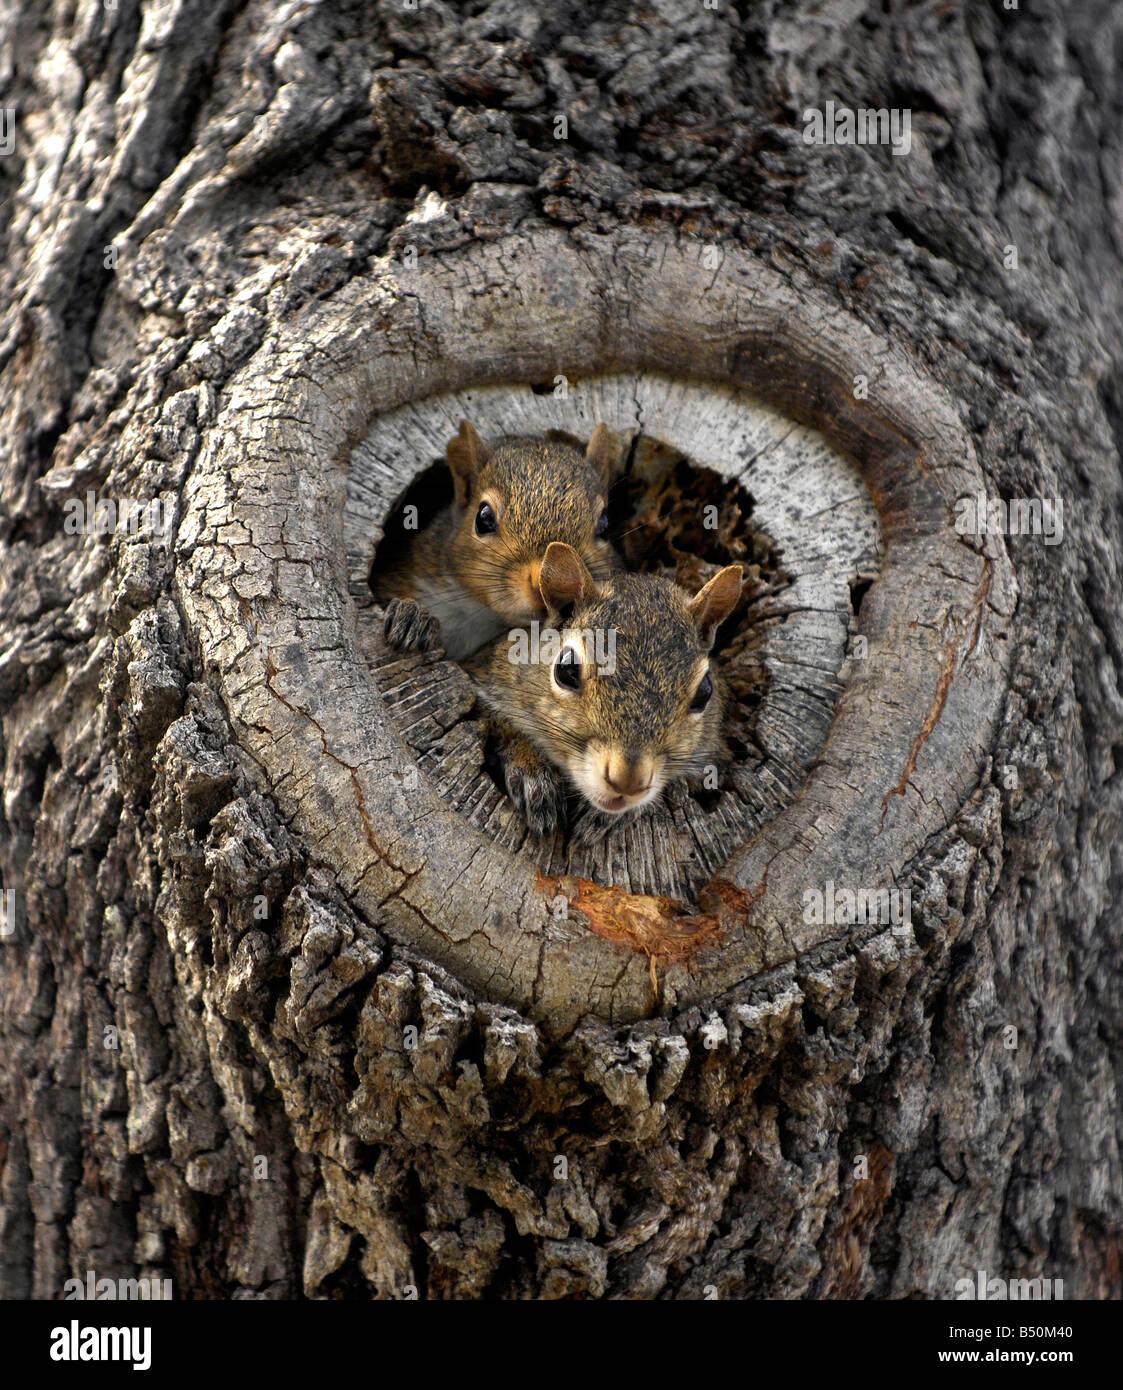 squirrel nest stockfotos squirrel nest bilder alamy. Black Bedroom Furniture Sets. Home Design Ideas